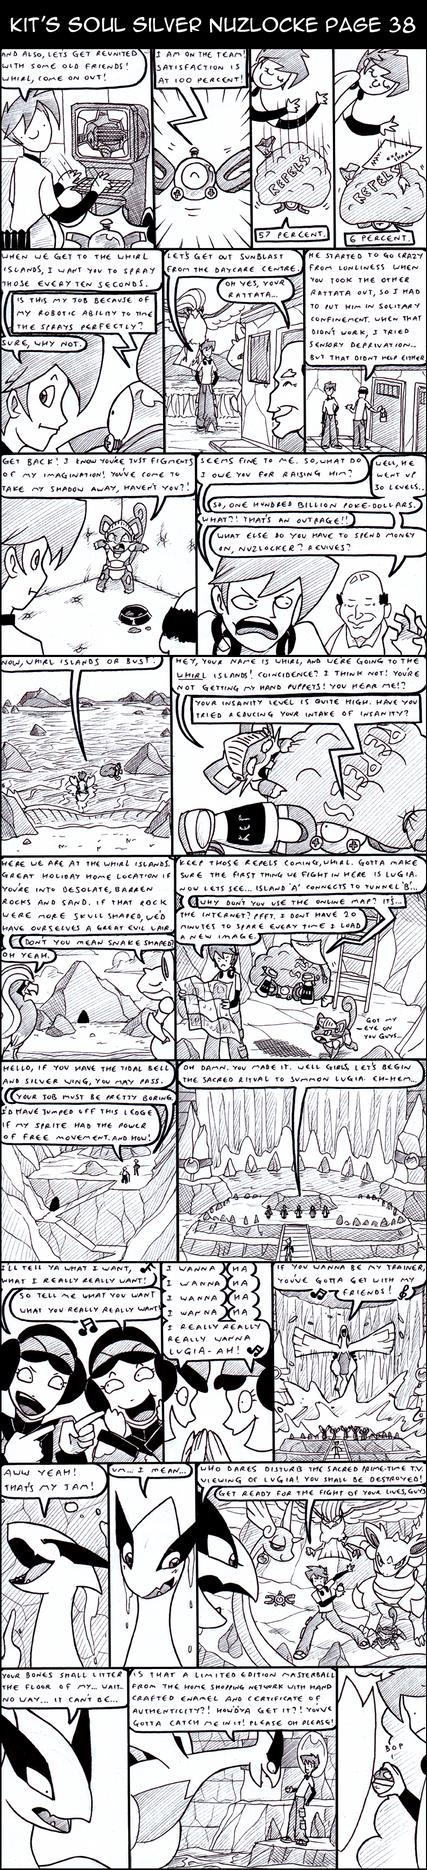 Kit's Soul Silver Nuzlocke page 38 by kitfox-crimson